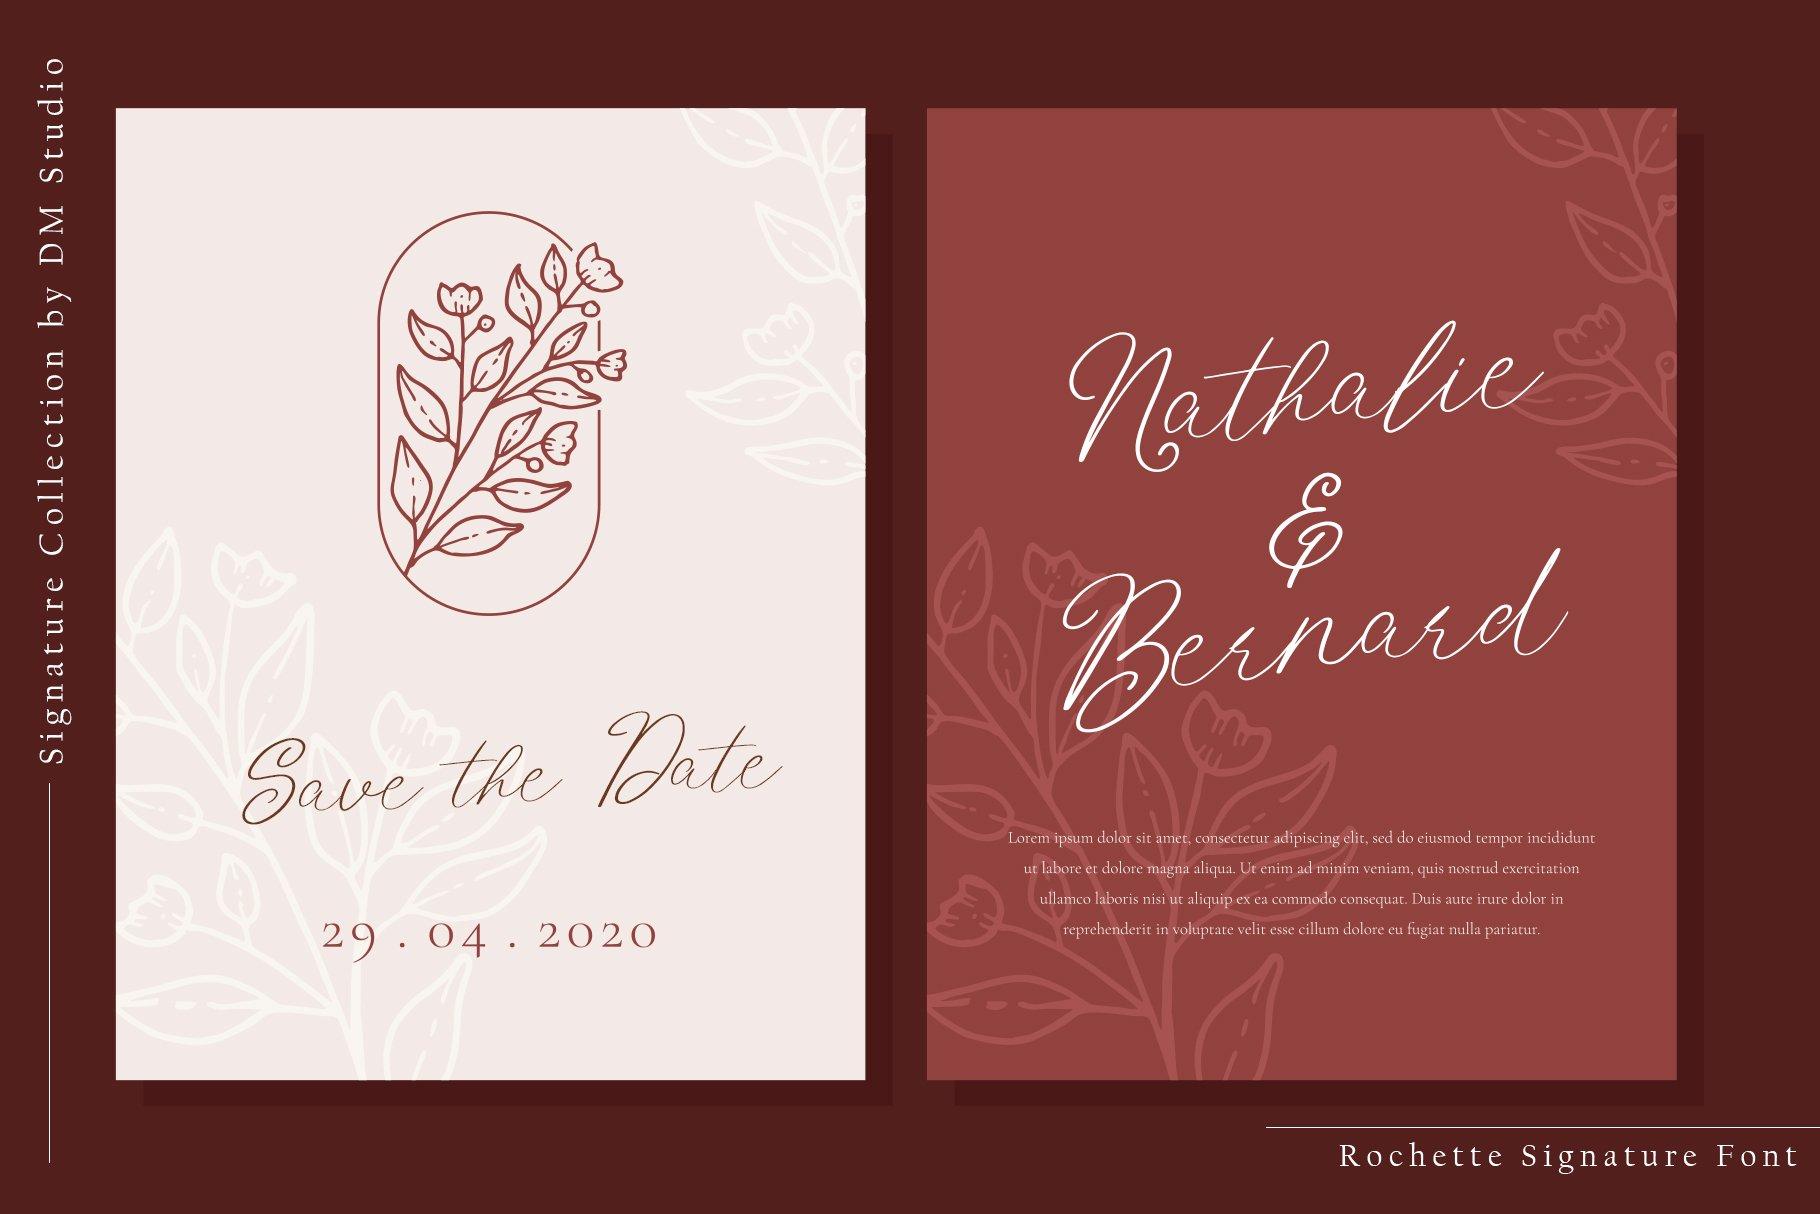 Rochette Elegant Signature Font -2